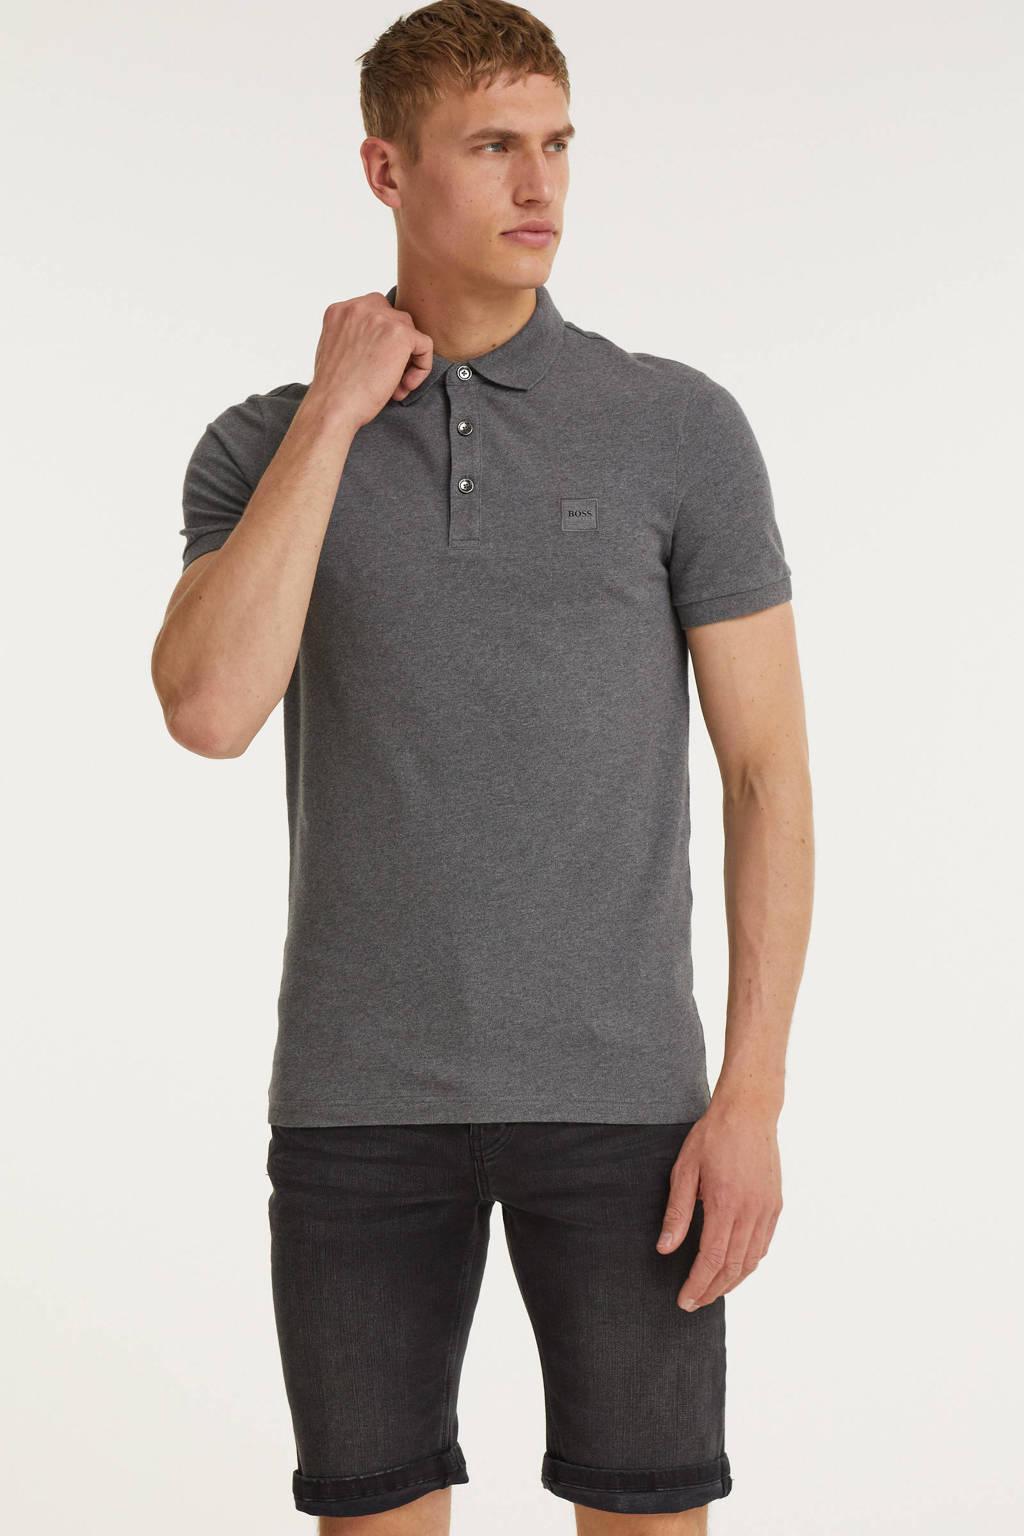 GABBIANO slim fit jeans short 82730 black, Black